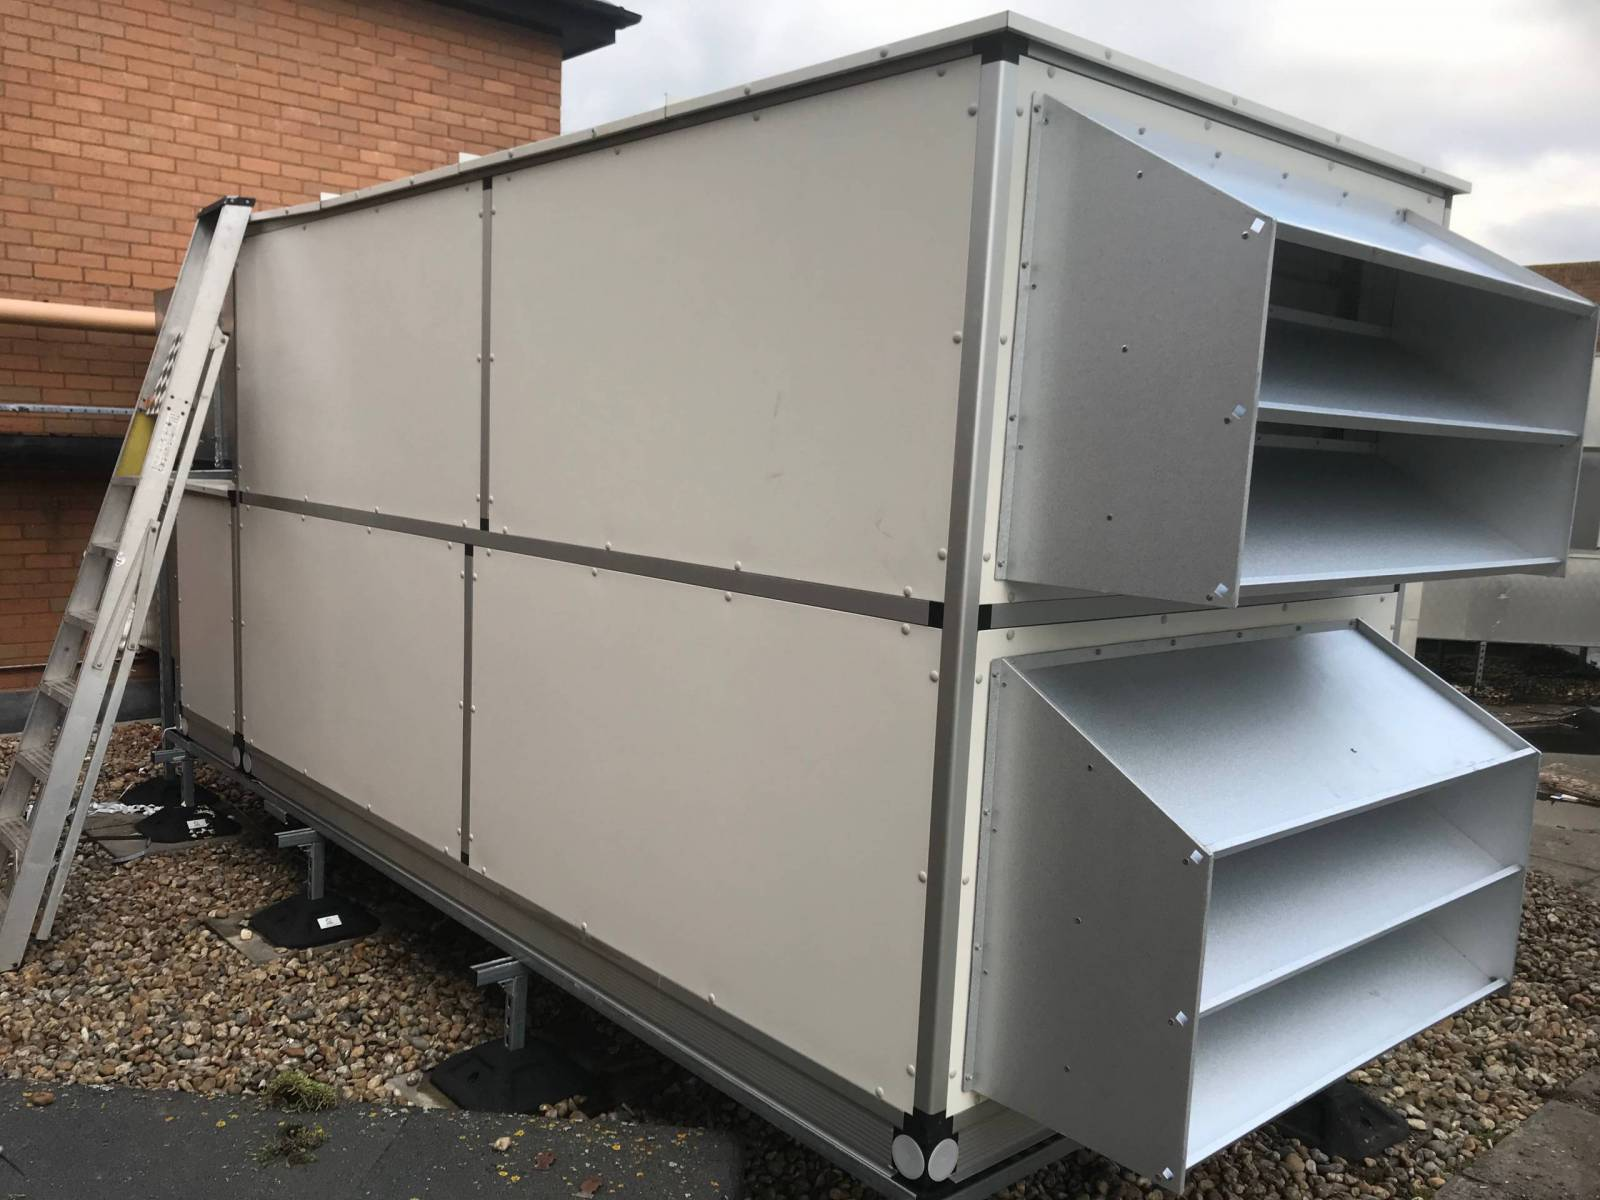 air-conditioner-repair-london-residential-air-conditioning-london